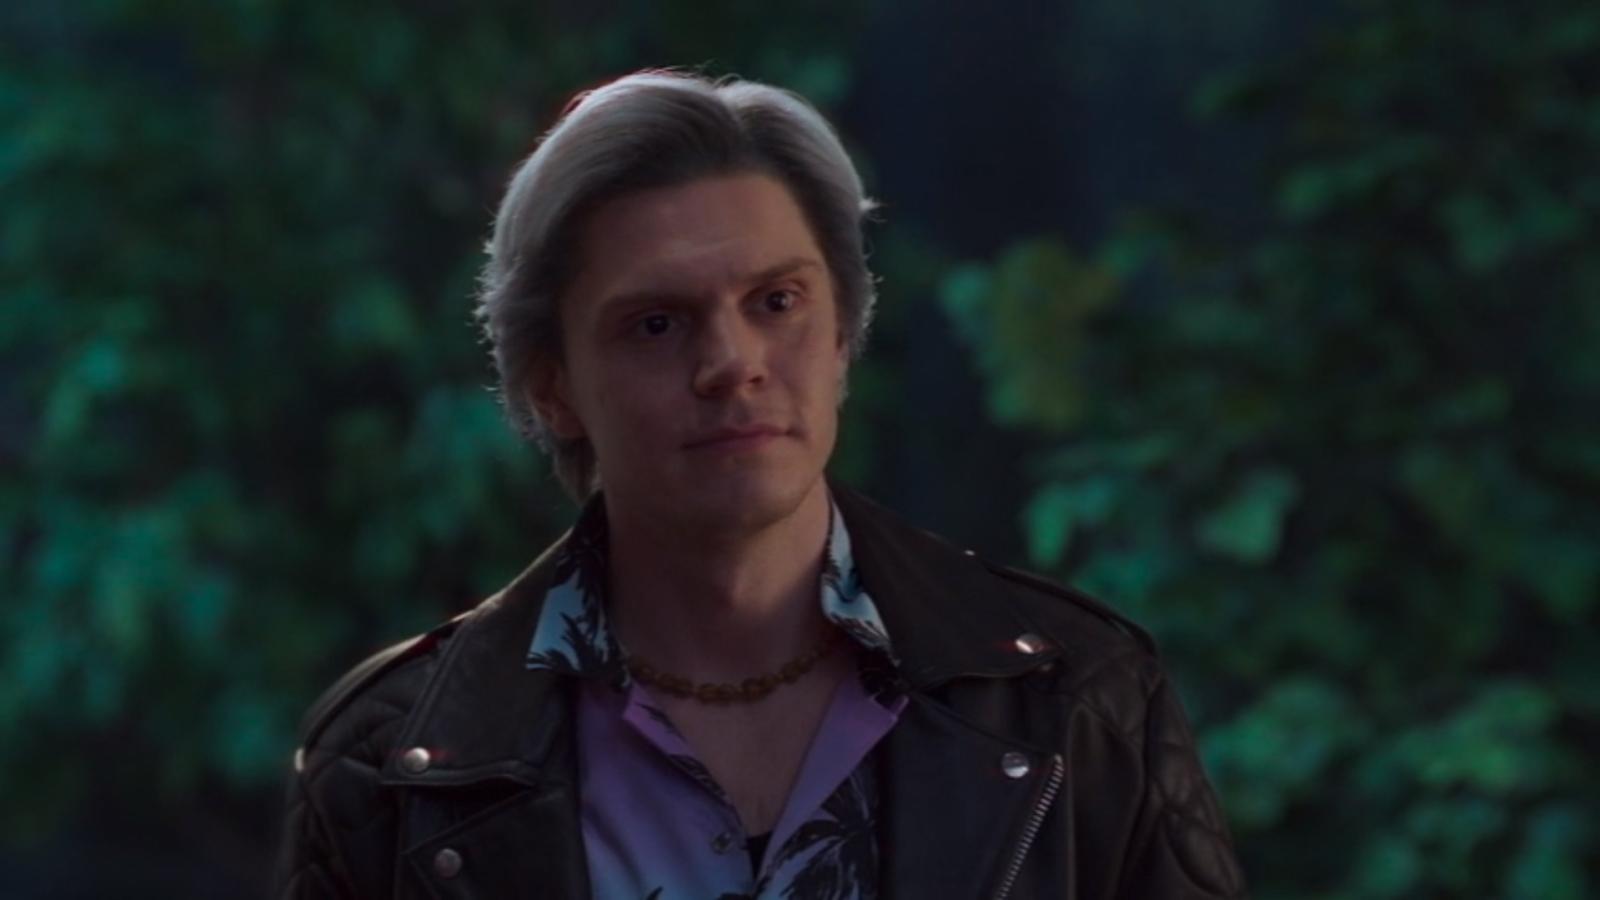 Evan Peters as Quicksilver in WandaVision